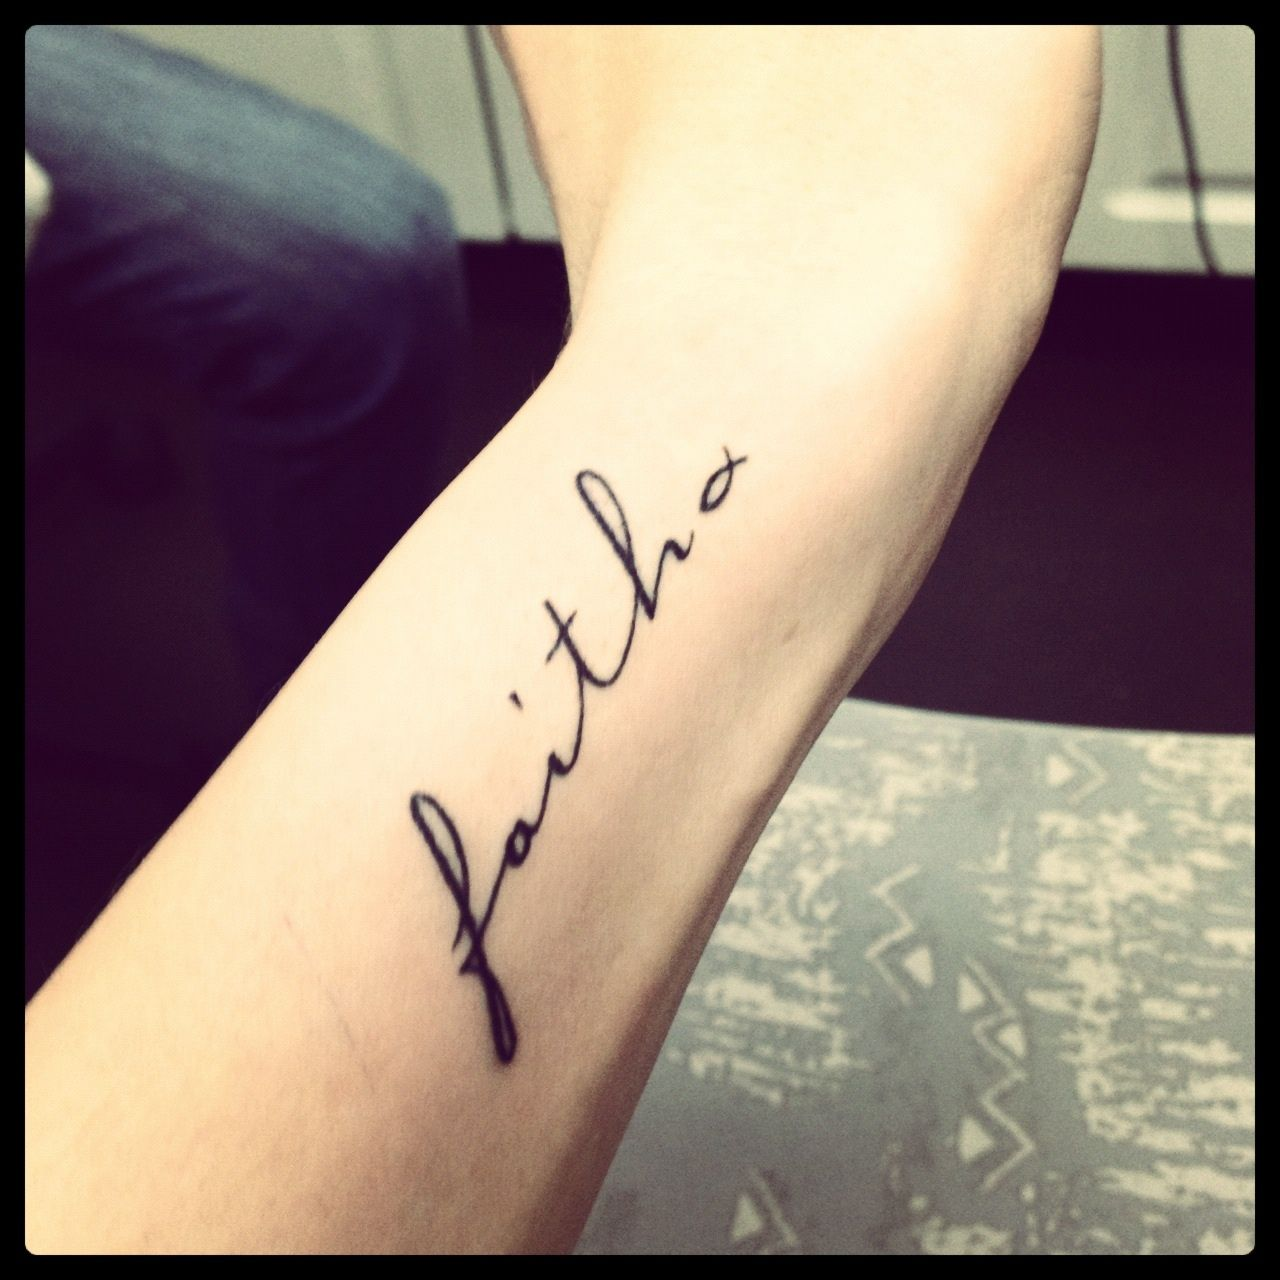 c8932cb7b Faith | Best tattoo ideas & designs Tatuajes Frases Brazo, Fuentes Para  Tatuajes, Tatuajes